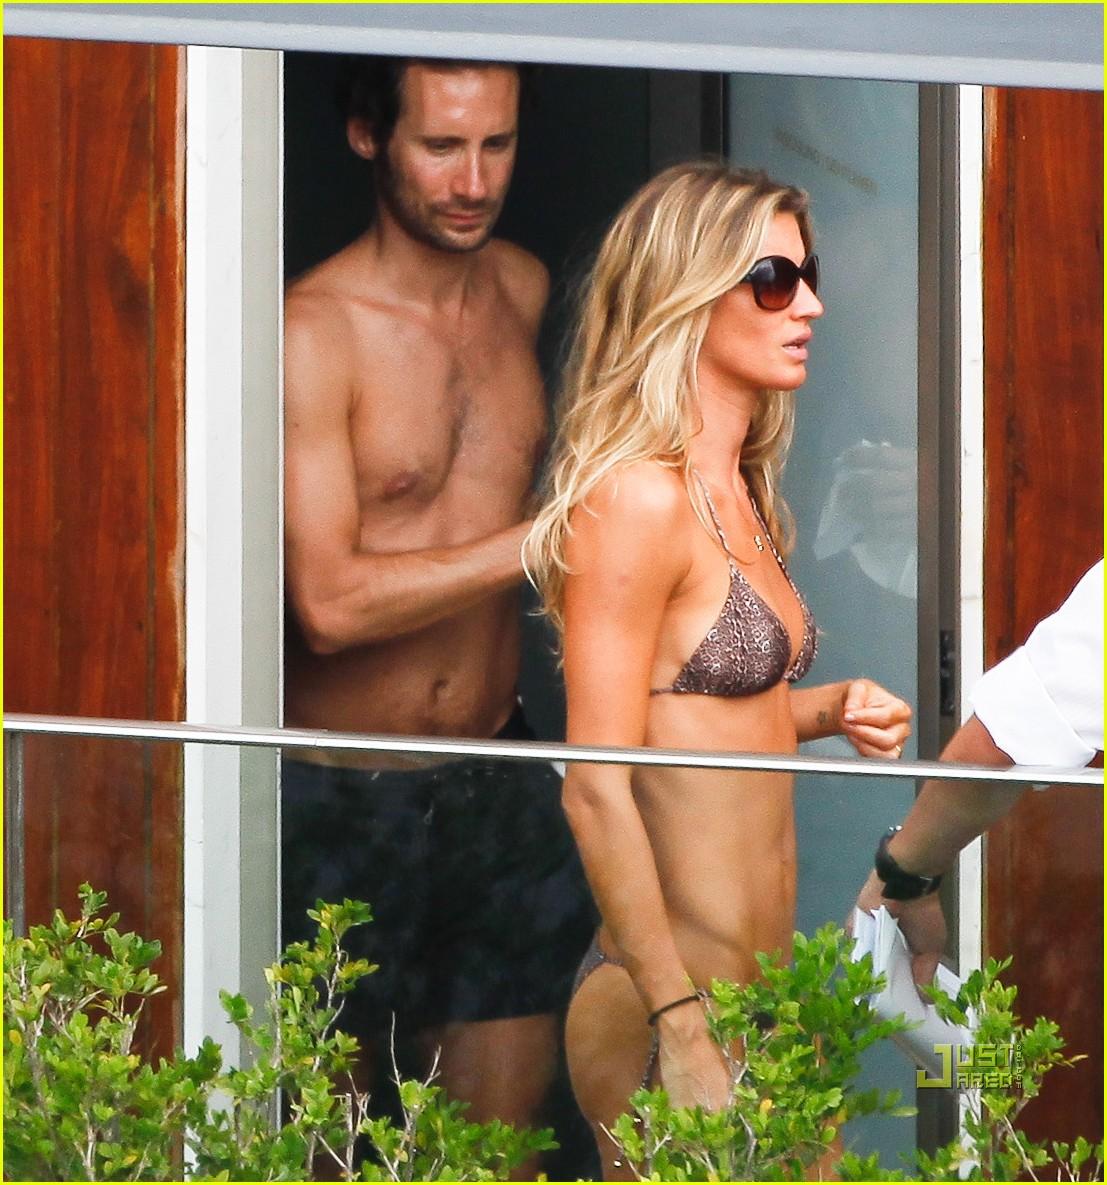 http://3.bp.blogspot.com/-Bl_6i1HYmKk/Tz1zgQj4aNI/AAAAAAAAGEw/Juz9EPq4nKI/s1600/gisele-bundchen-bikini-hotel-pool-brazil-02%255B1%255D.jpg